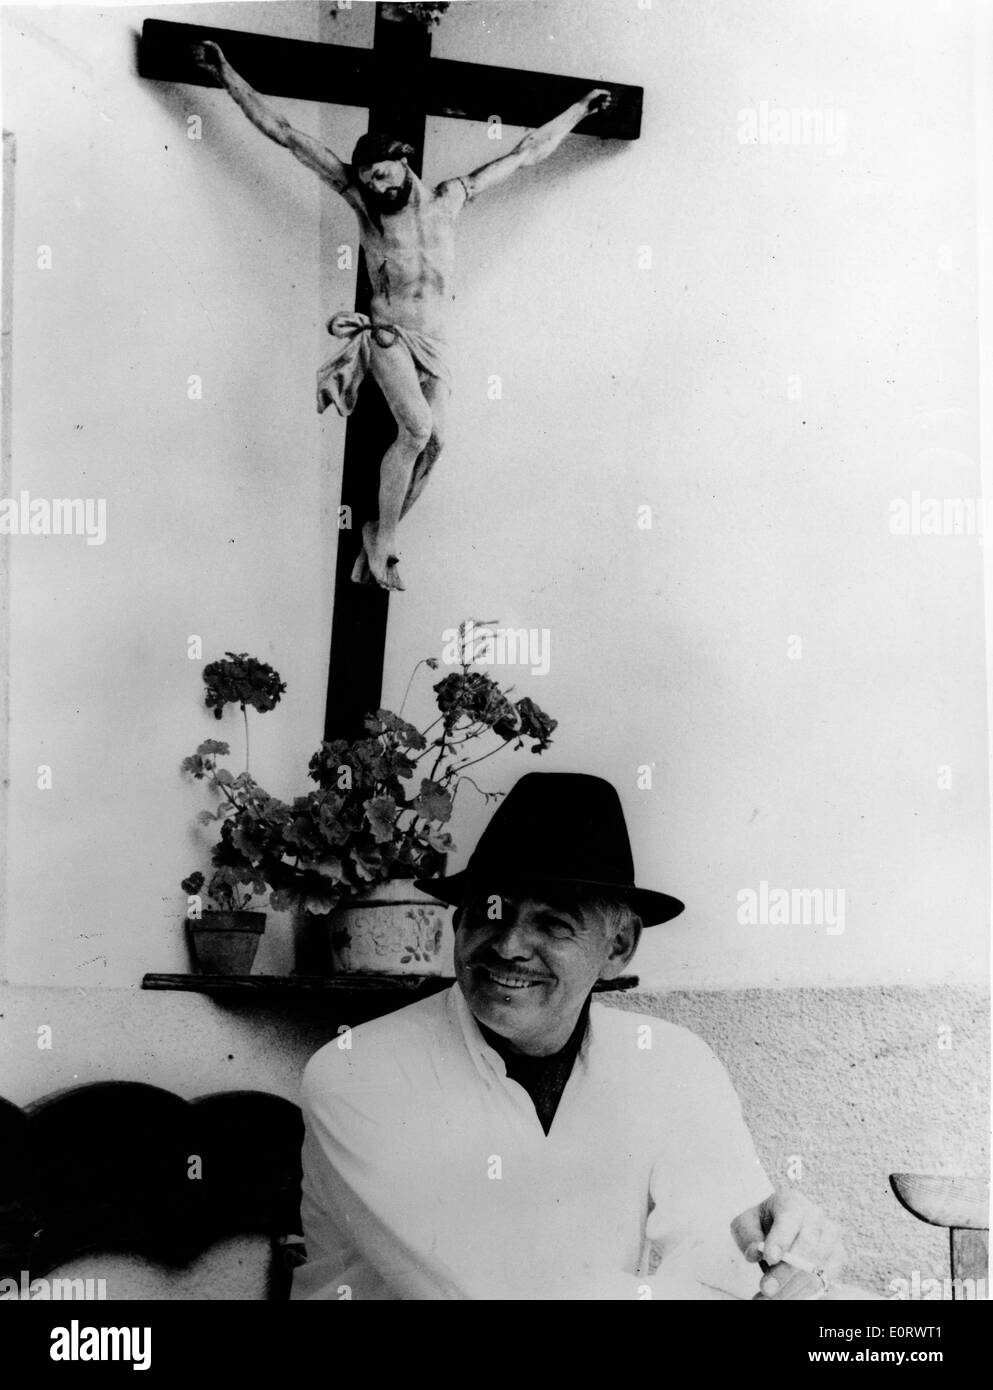 Actor Clark Gable enjoys a cigarette - Stock Image